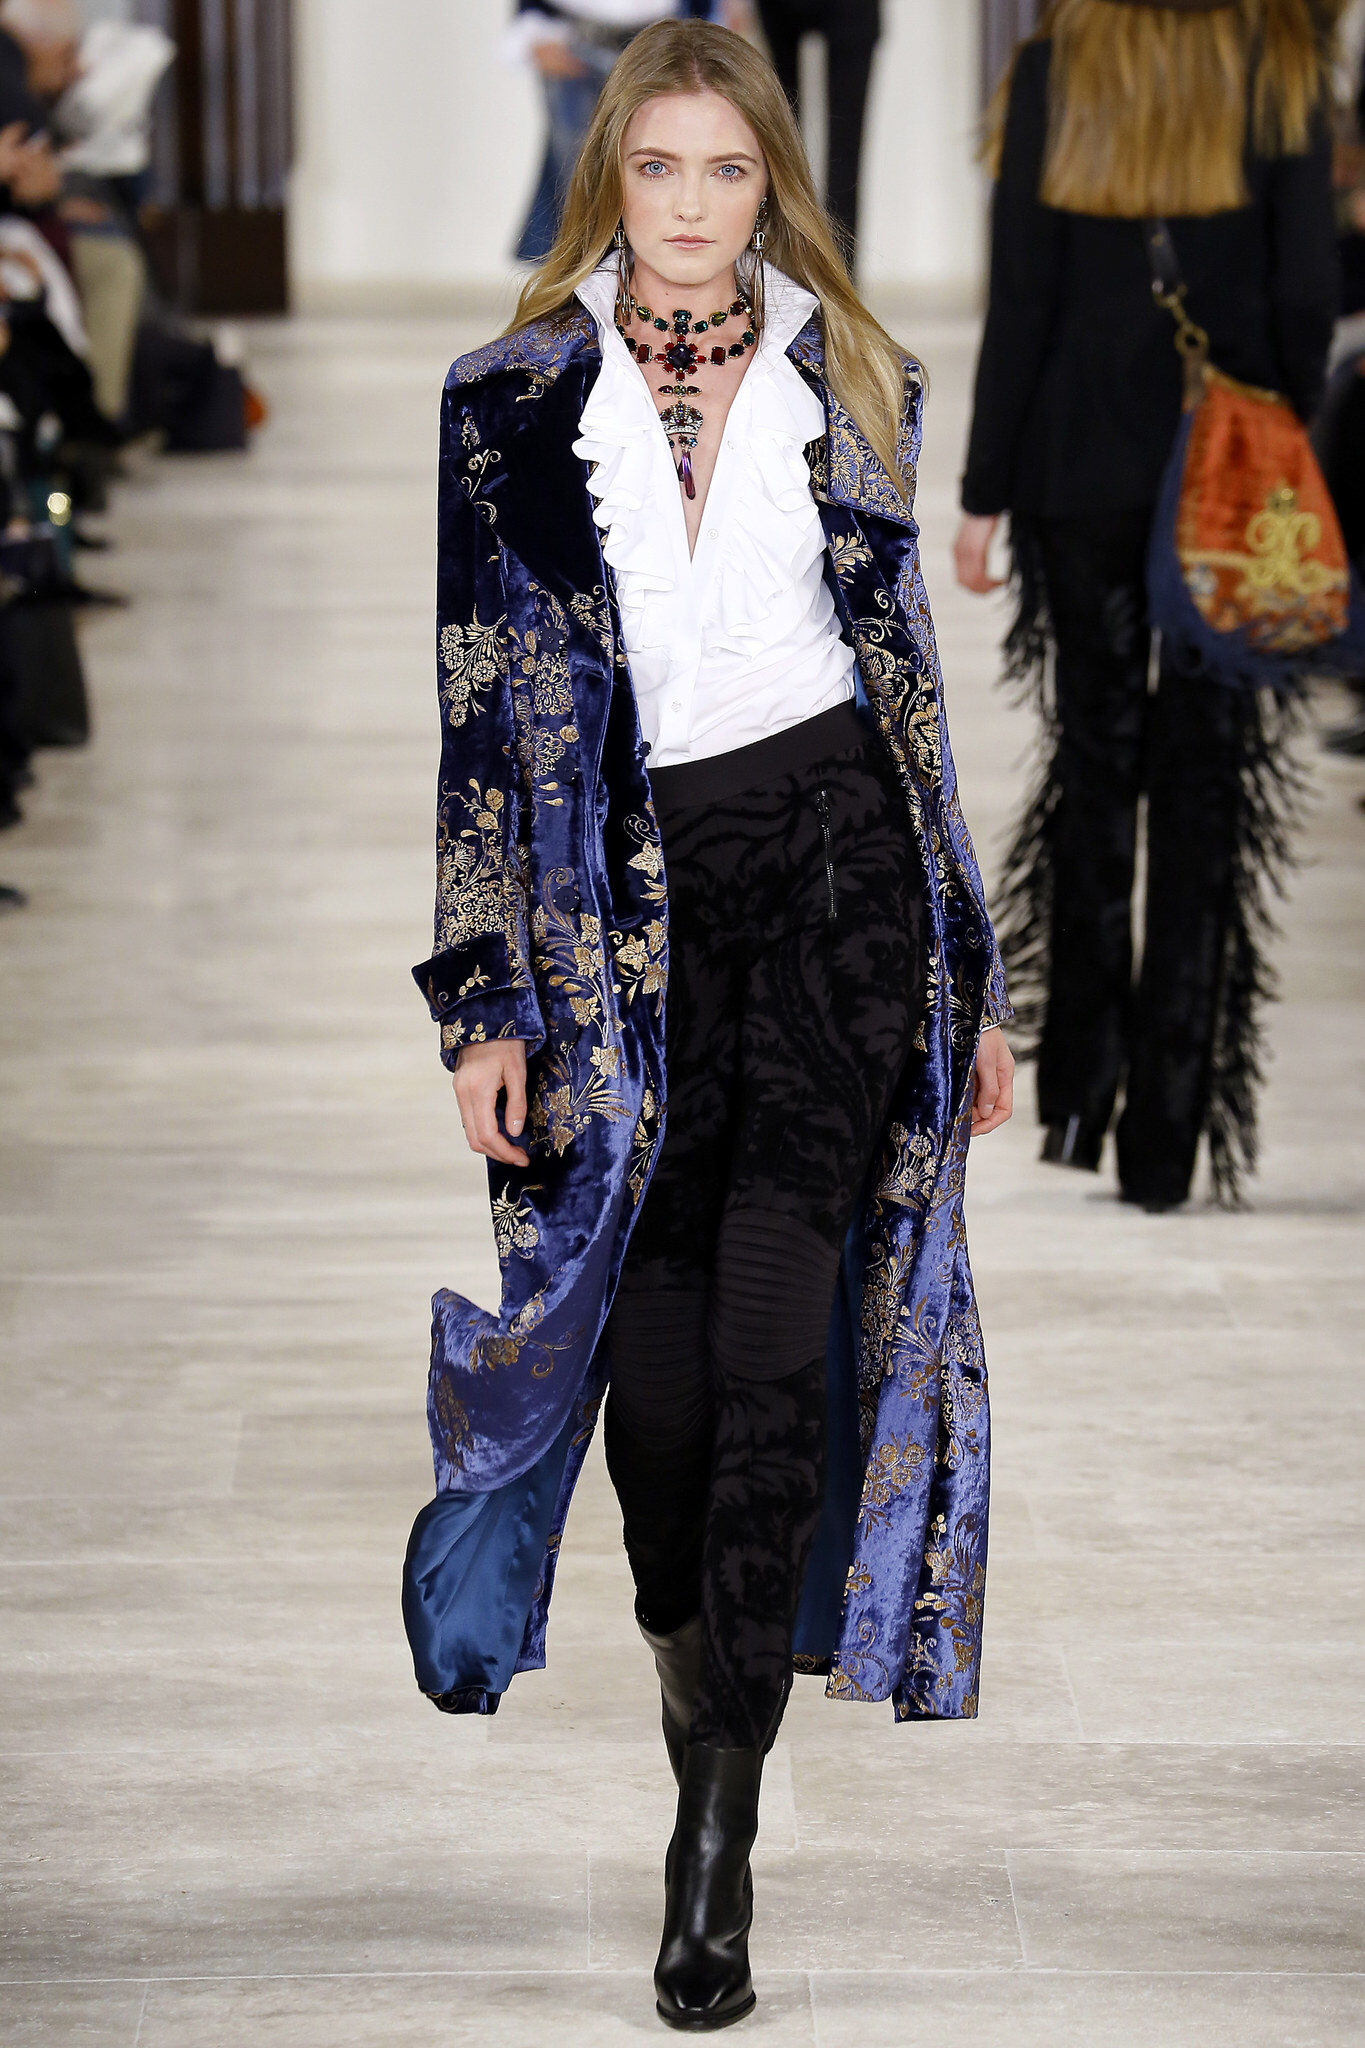 Ralph lauren influence on fashion 99